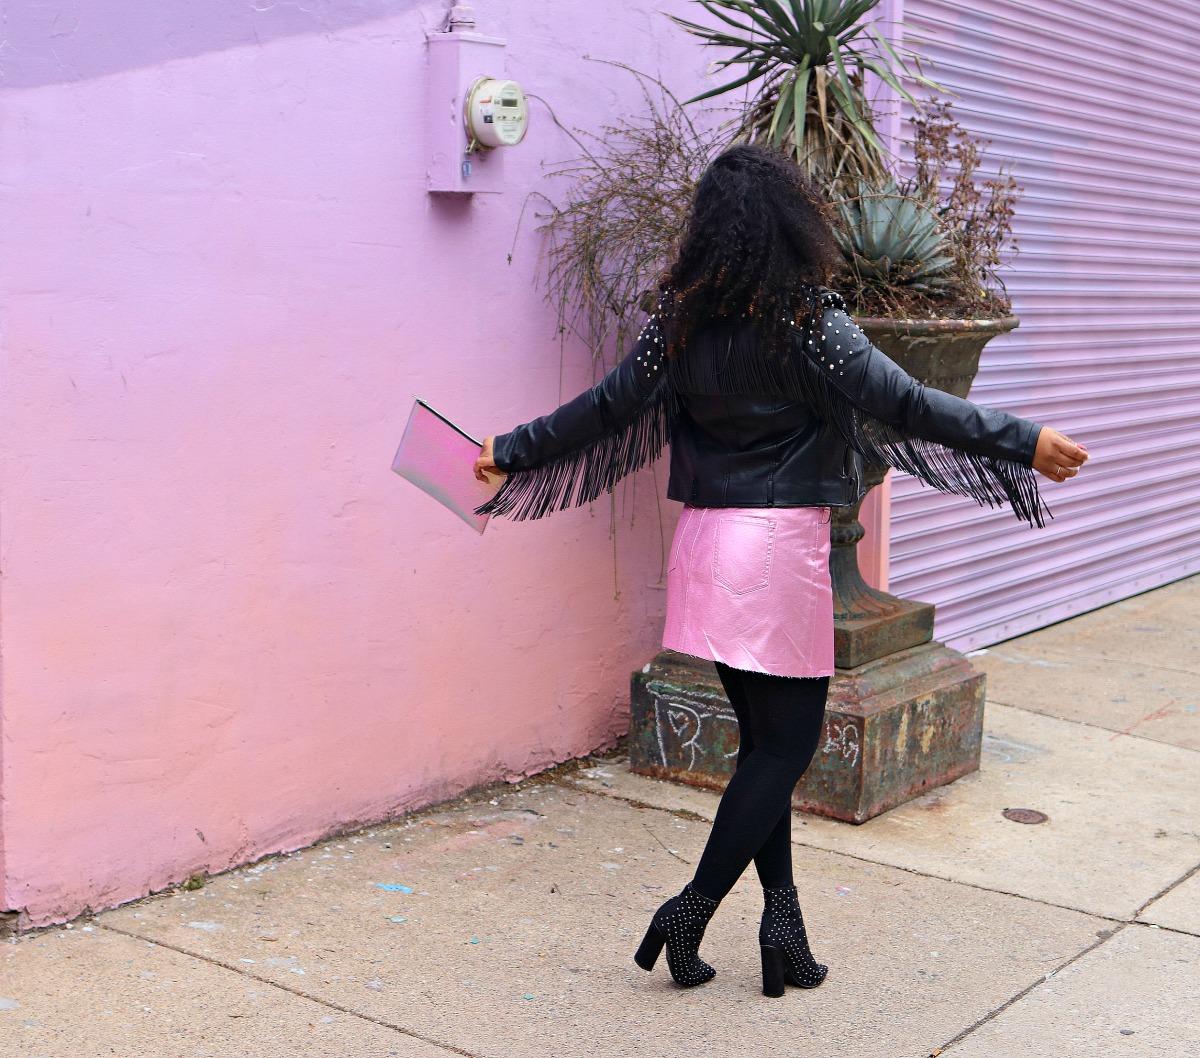 Style & Poise-Feminine Edge, Pink Metallic Mini, Studded Leather Jacket, Studded Boots.